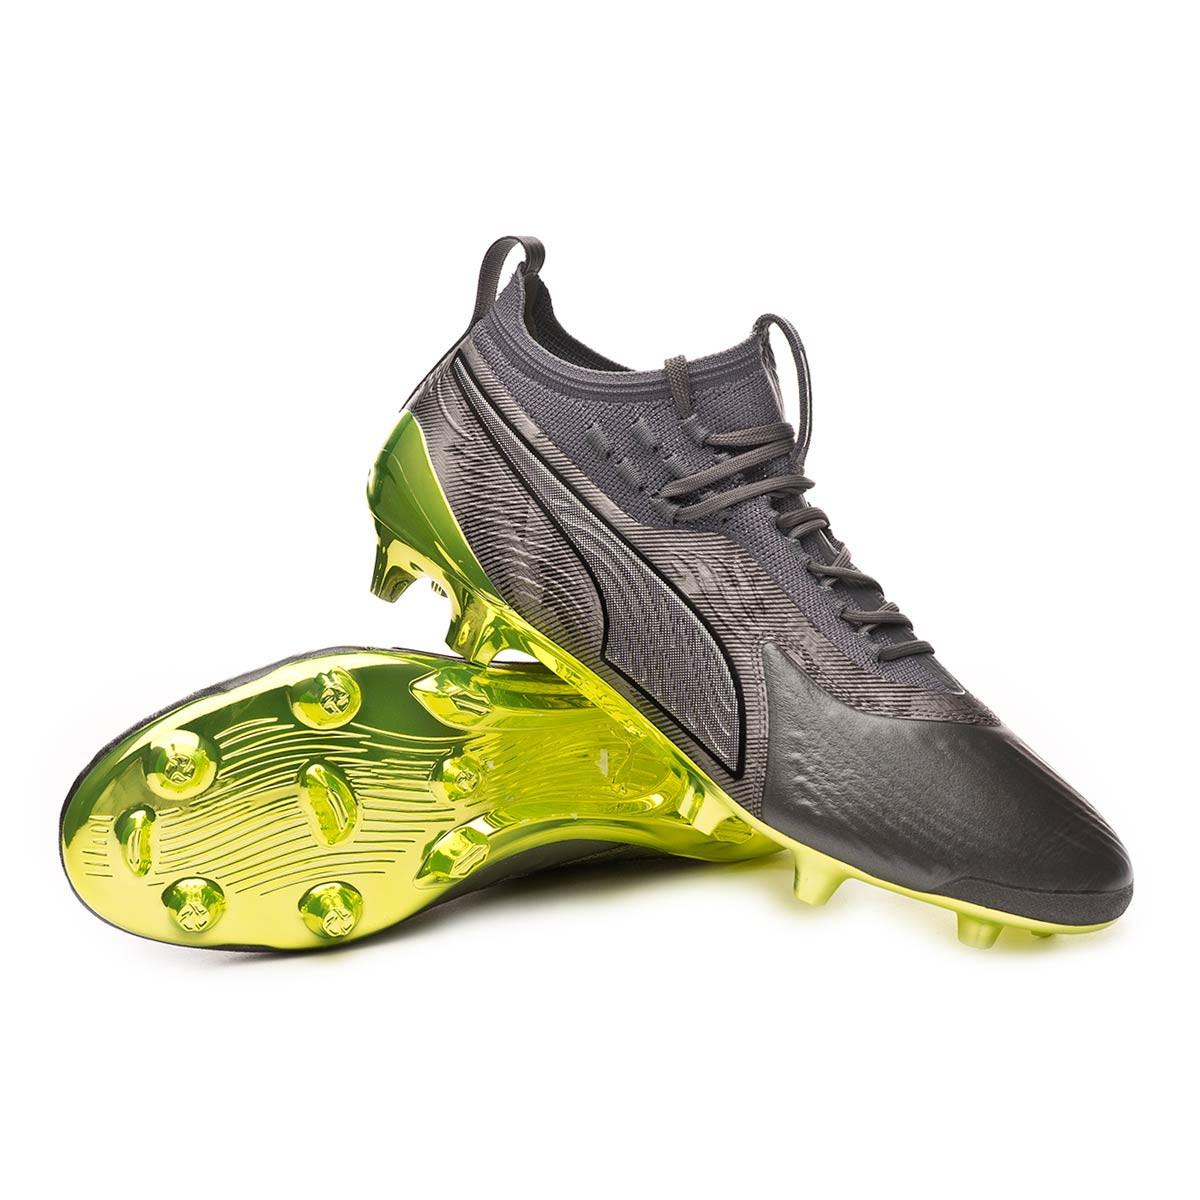 Puma One 19.1 Ltd.Ed. FG/AG Football Boots